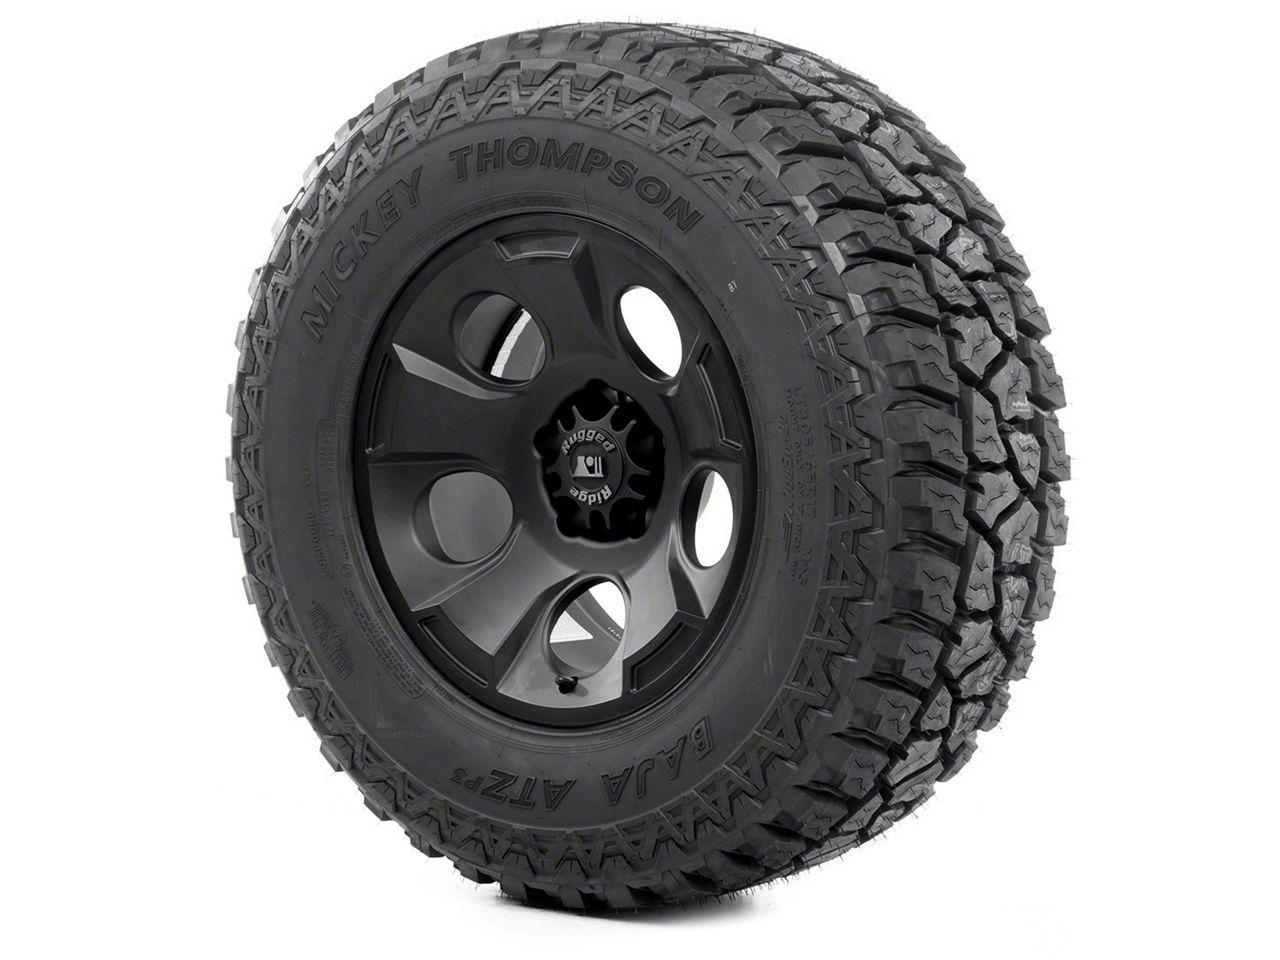 Rugged Ridge Drakon Wheel 17x9 Black Satin and Mickey Thompson ATZ P3 315/70R17 Tire (13-18 Jeep Wrangler JK; 2018 Jeep Wrangler JL)